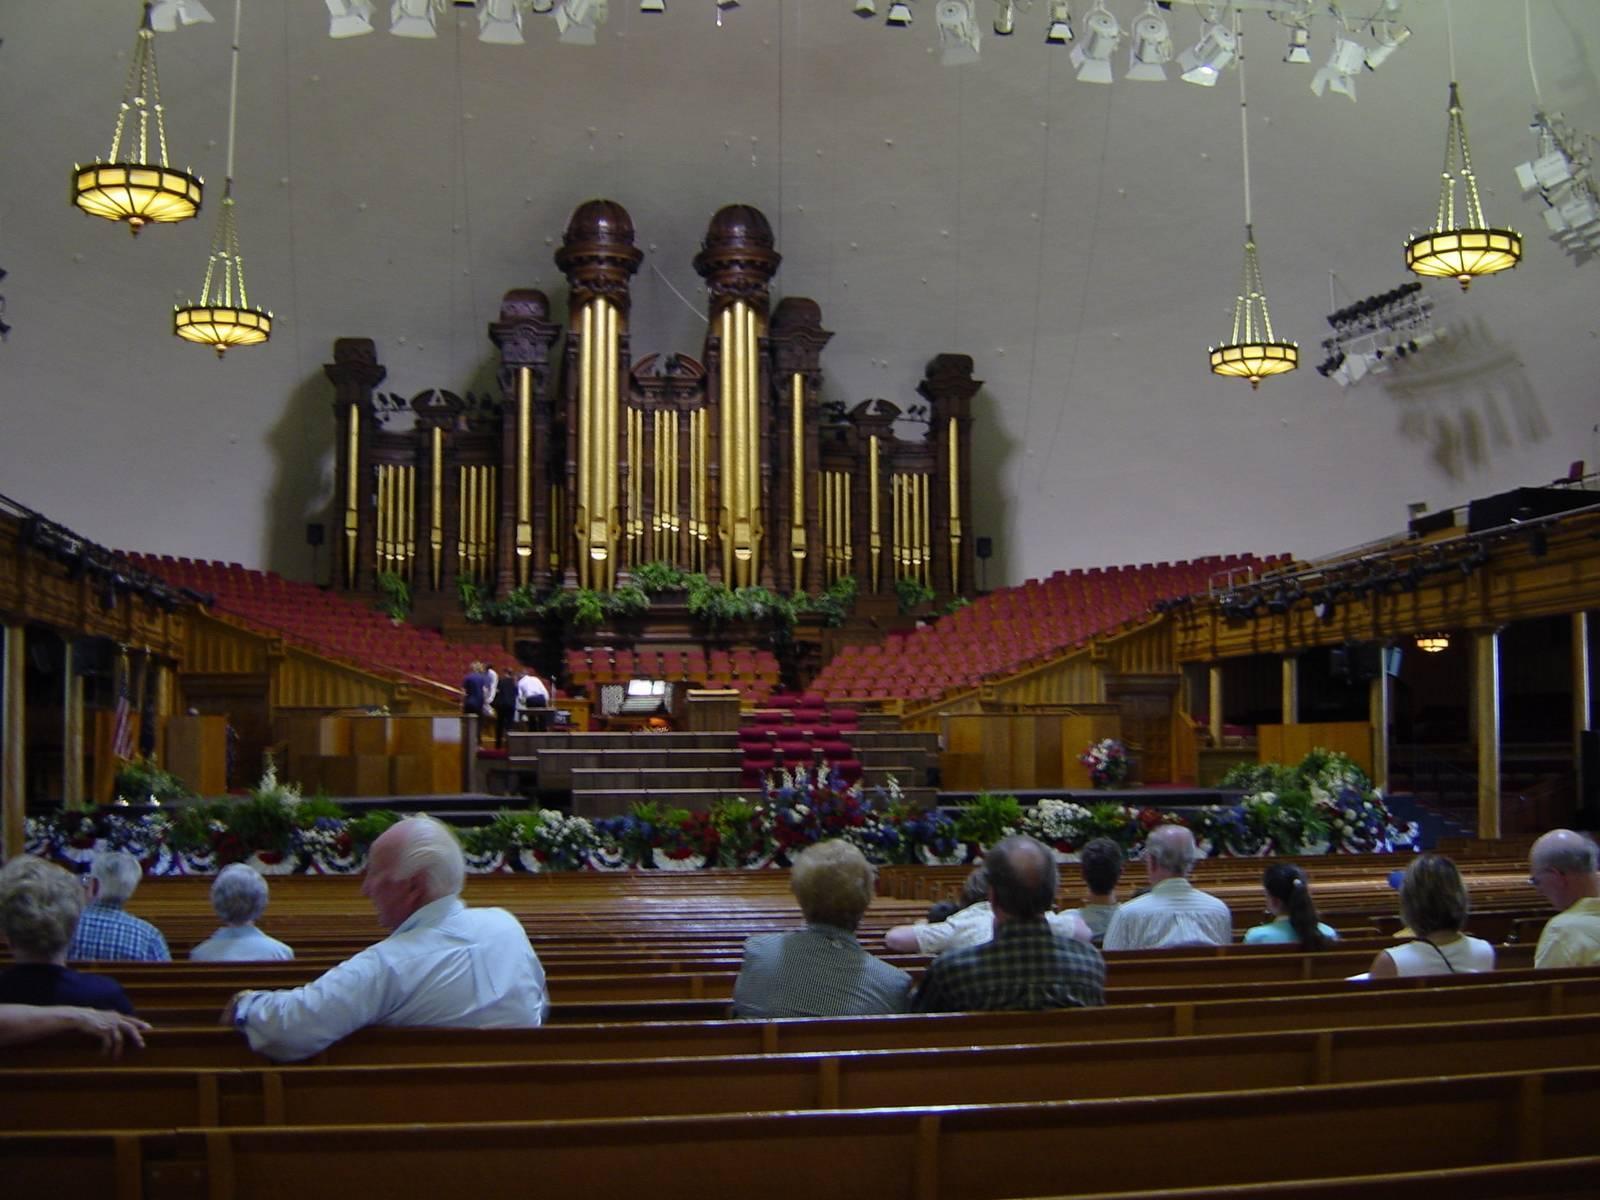 Tabernacle, Orgelkonzert